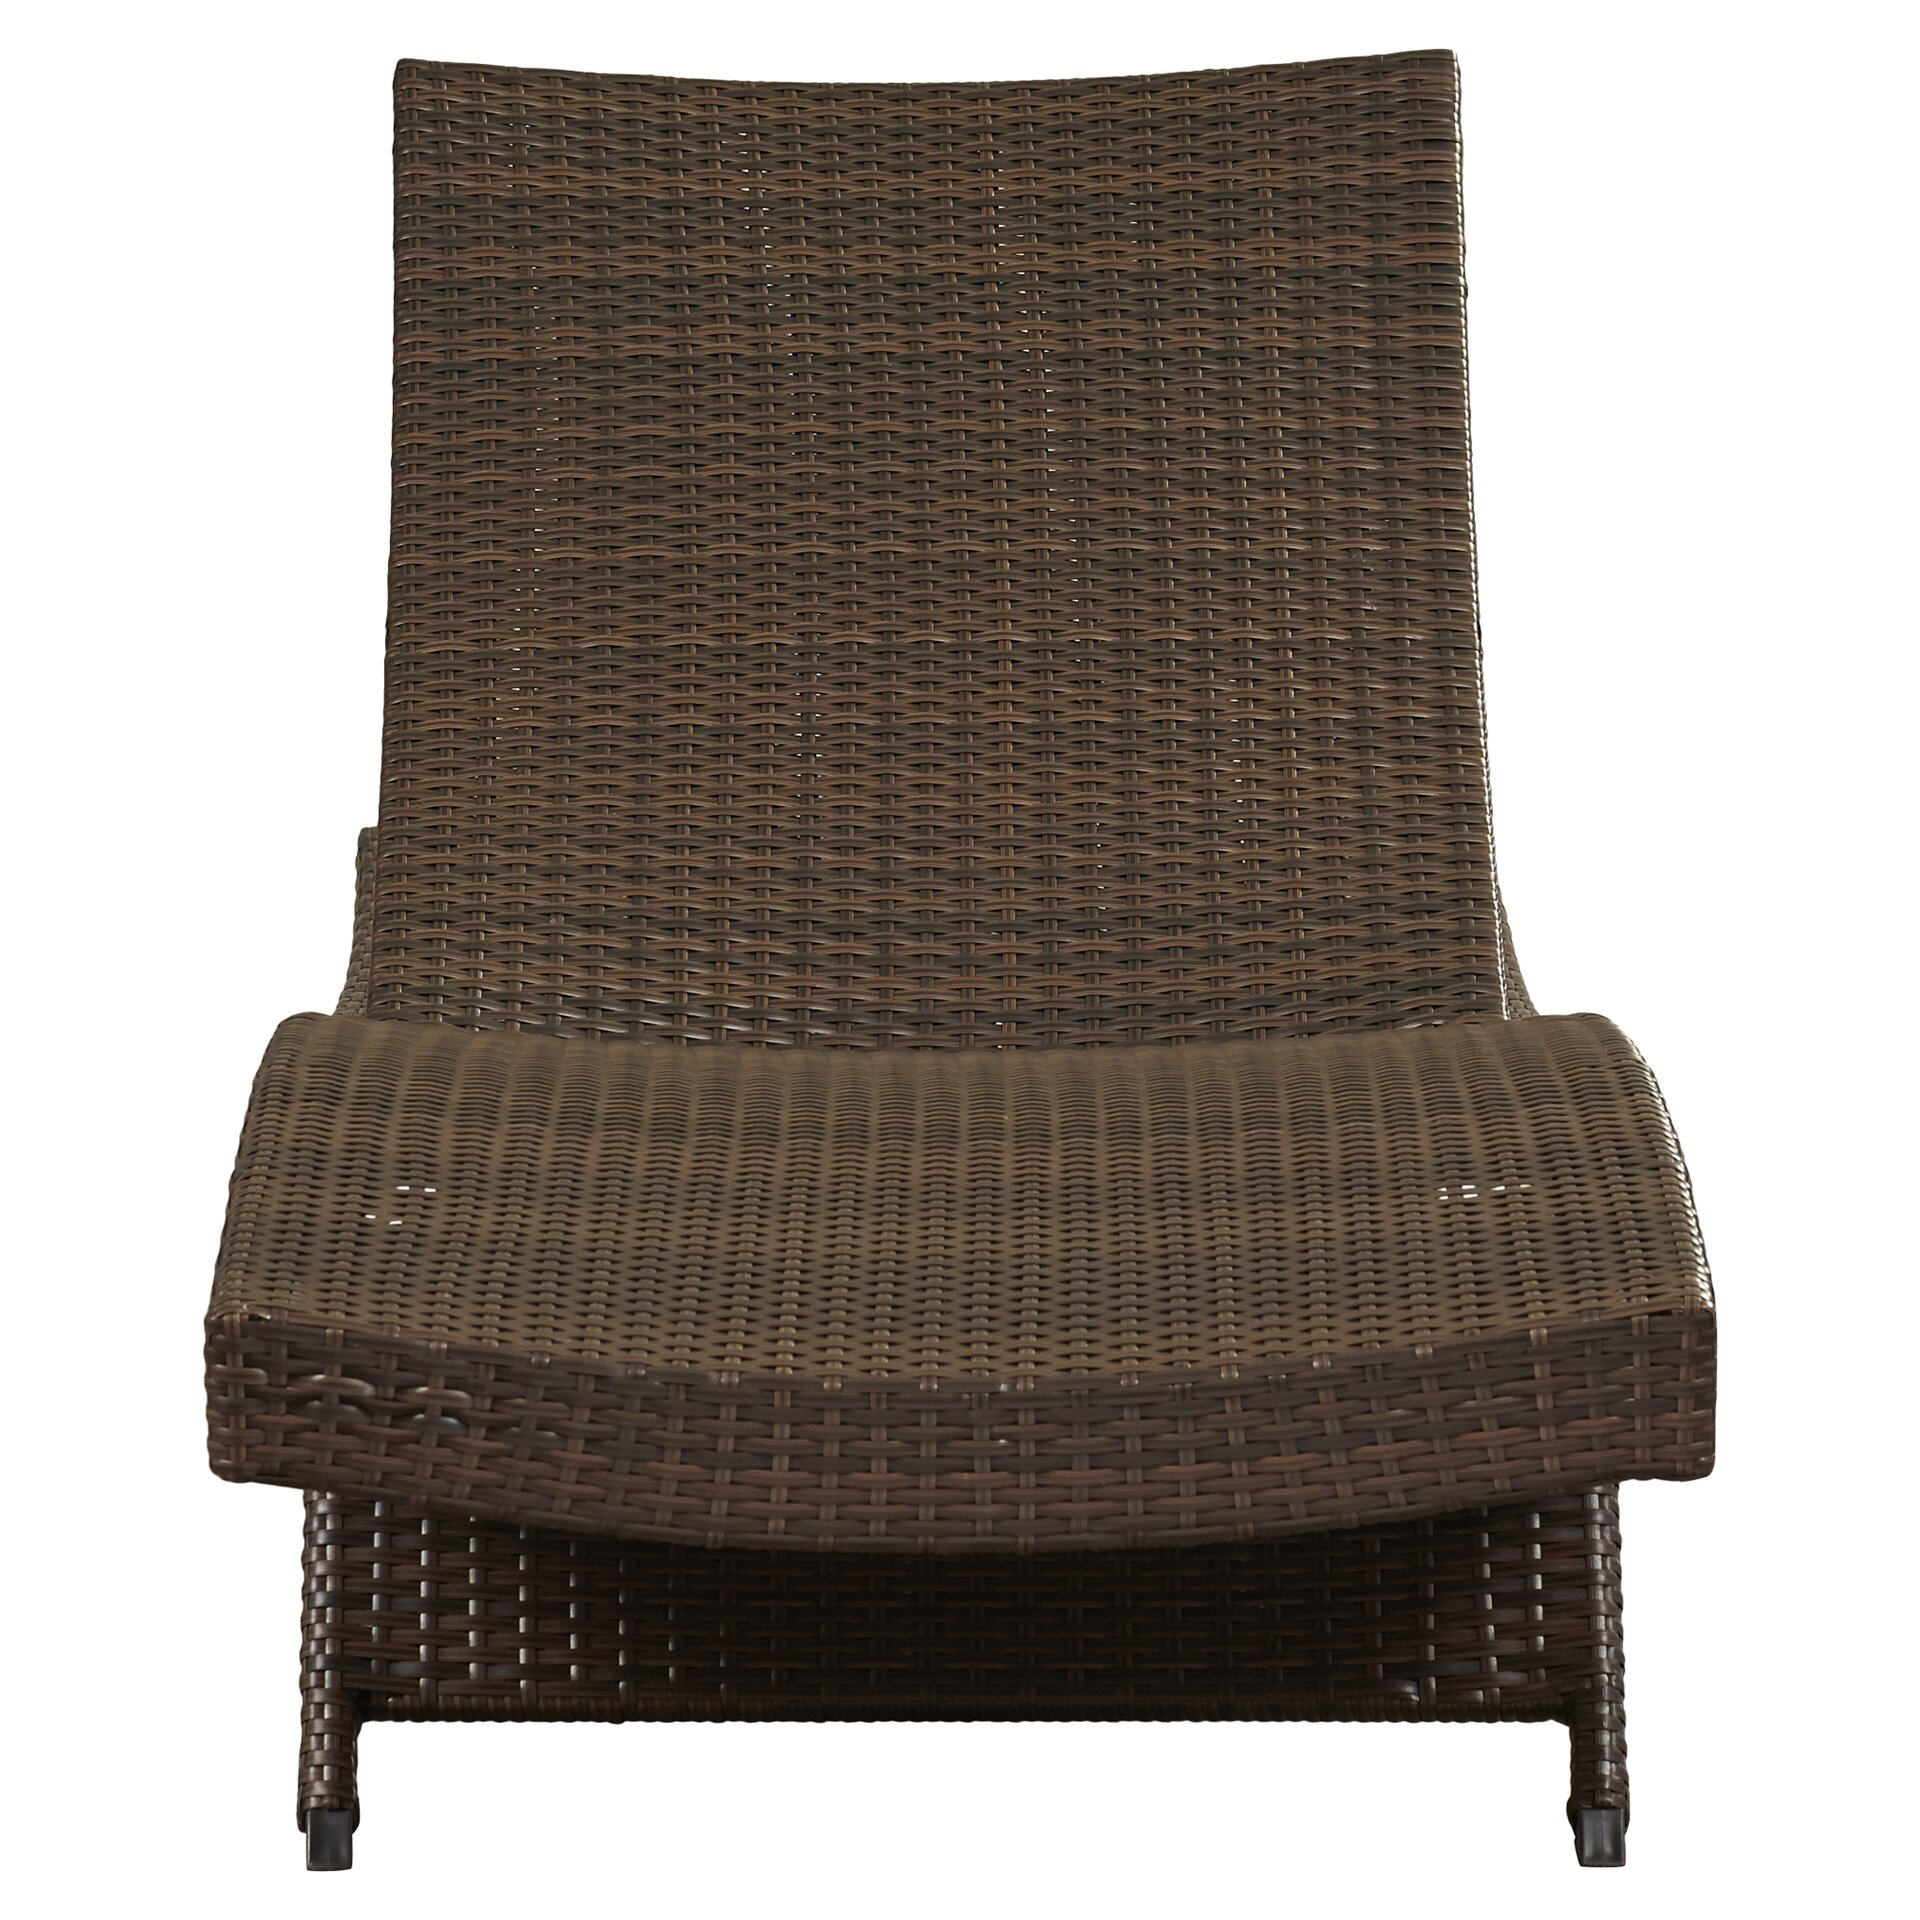 Brayden Studio Mathena Adjustable Chaise Lounge Amp Reviews